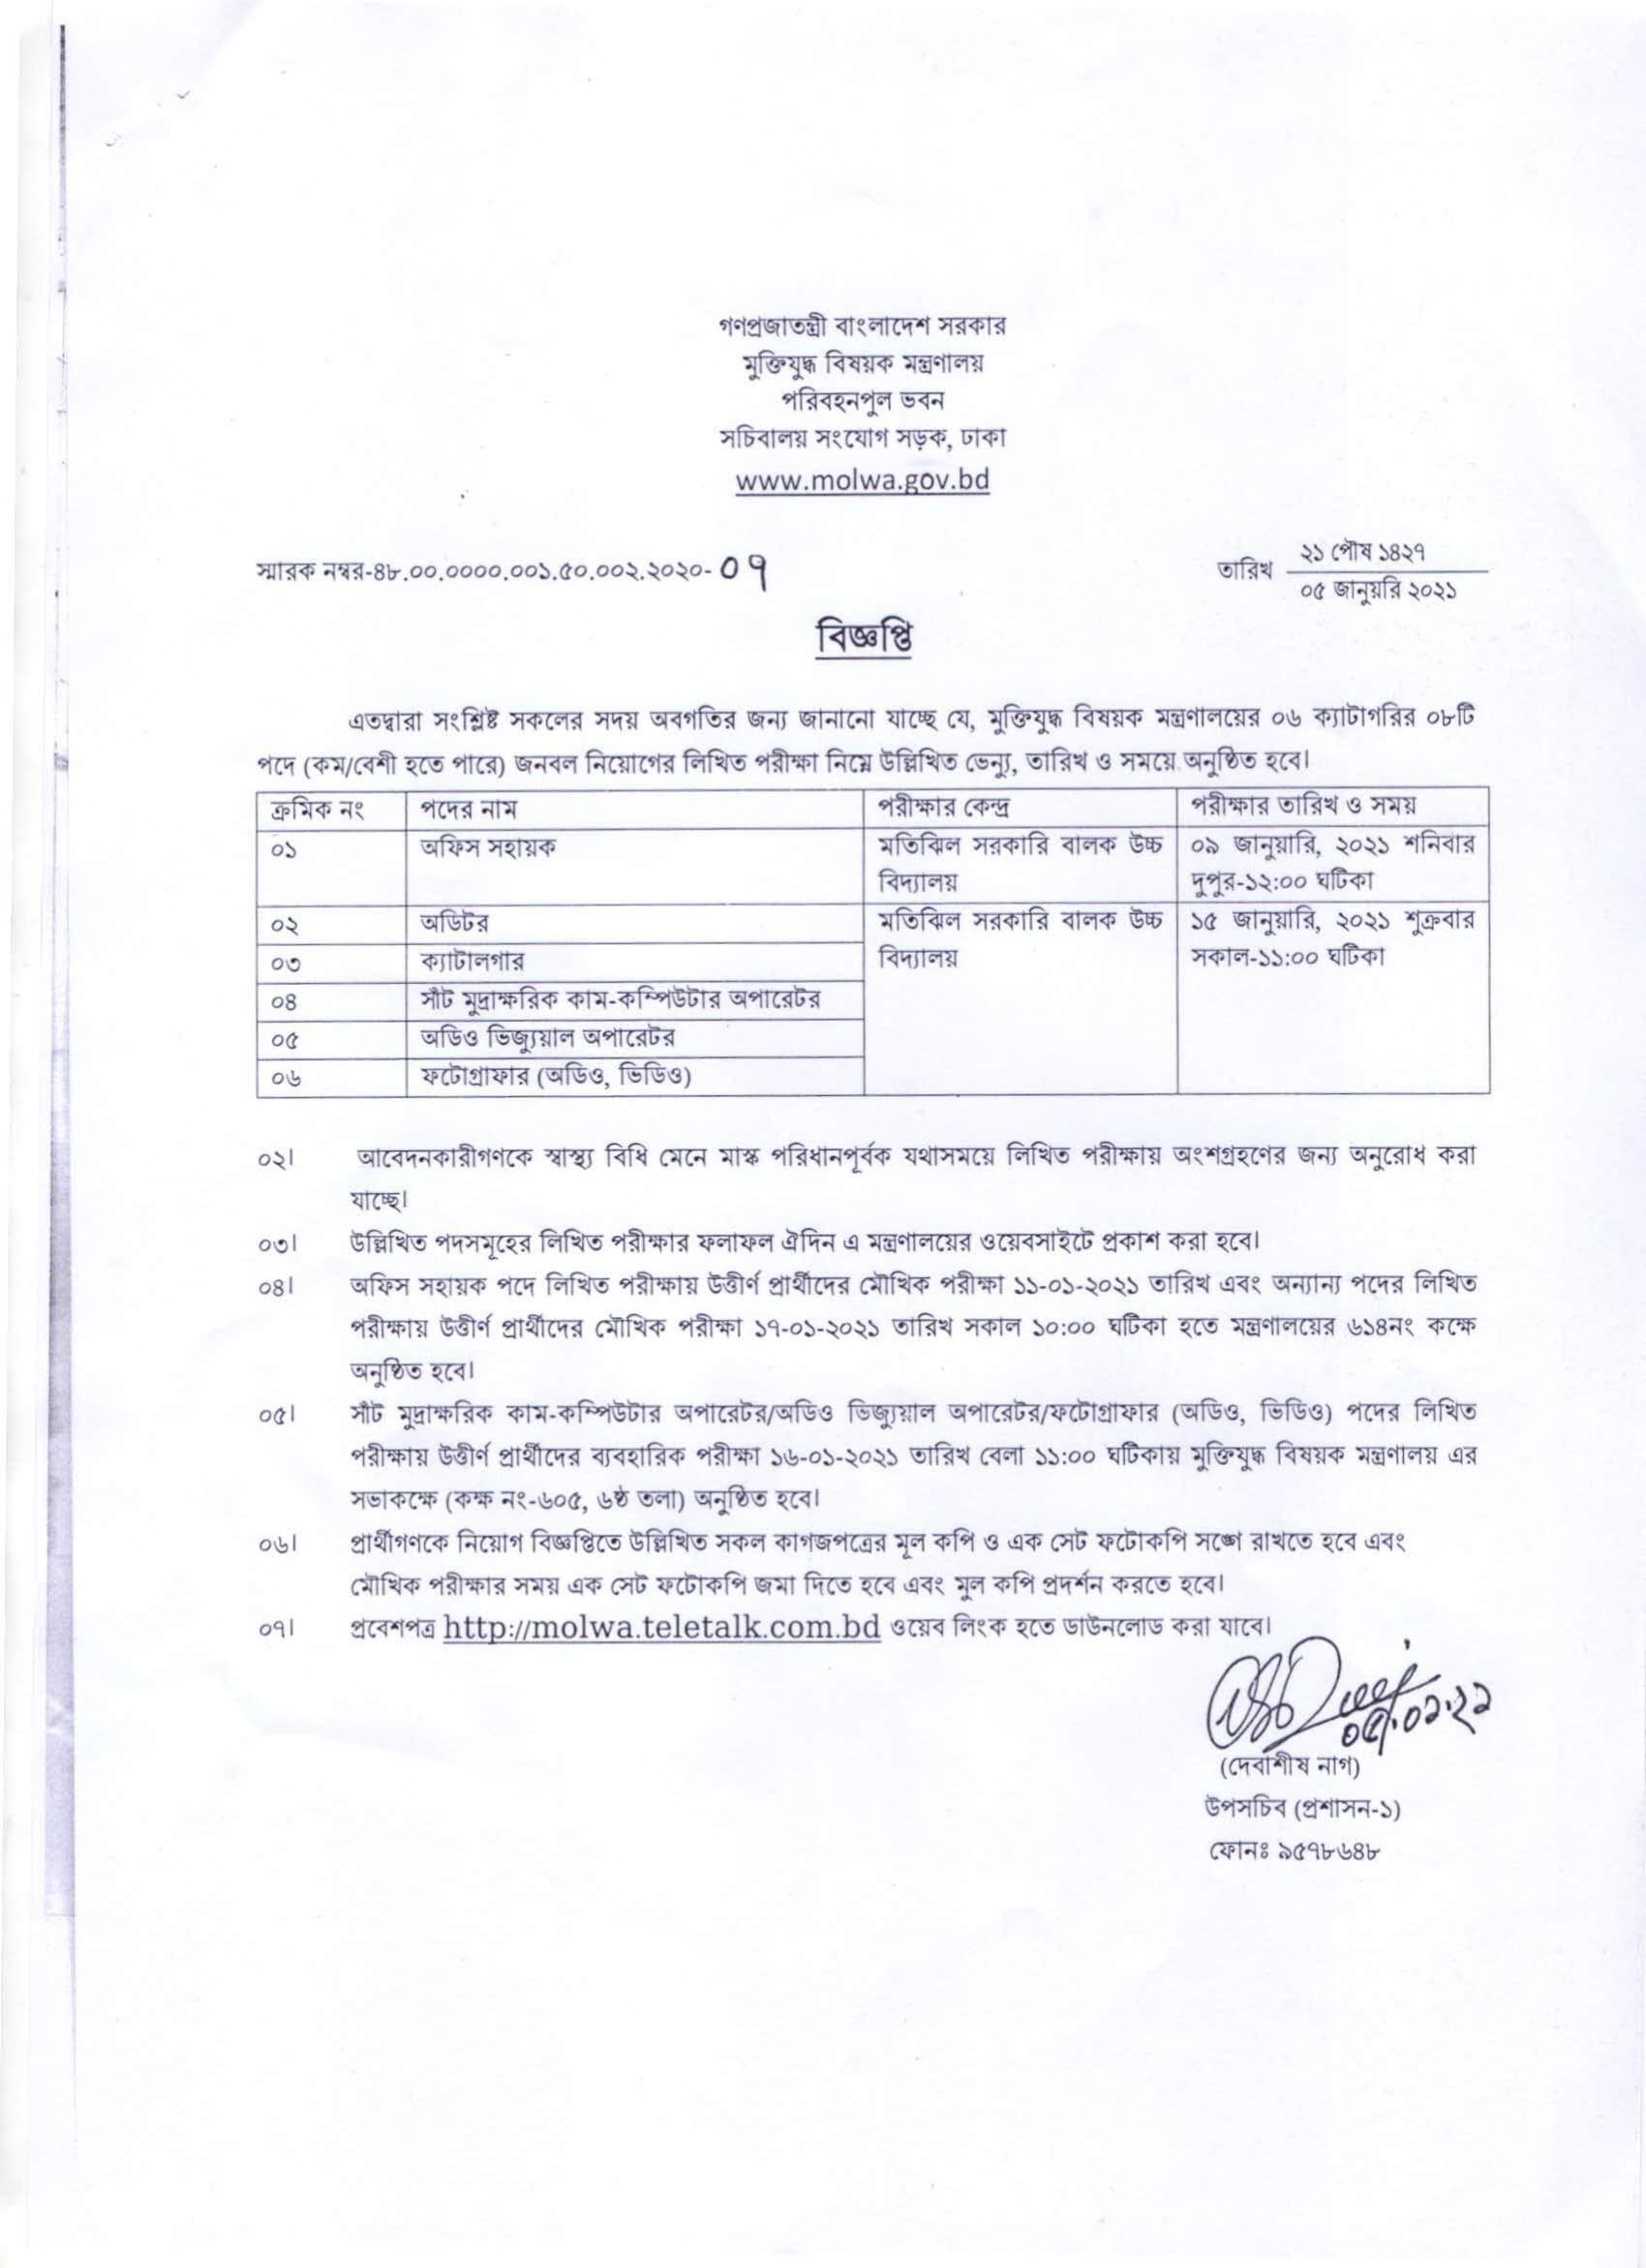 MOLWA Job Exam Date 2021